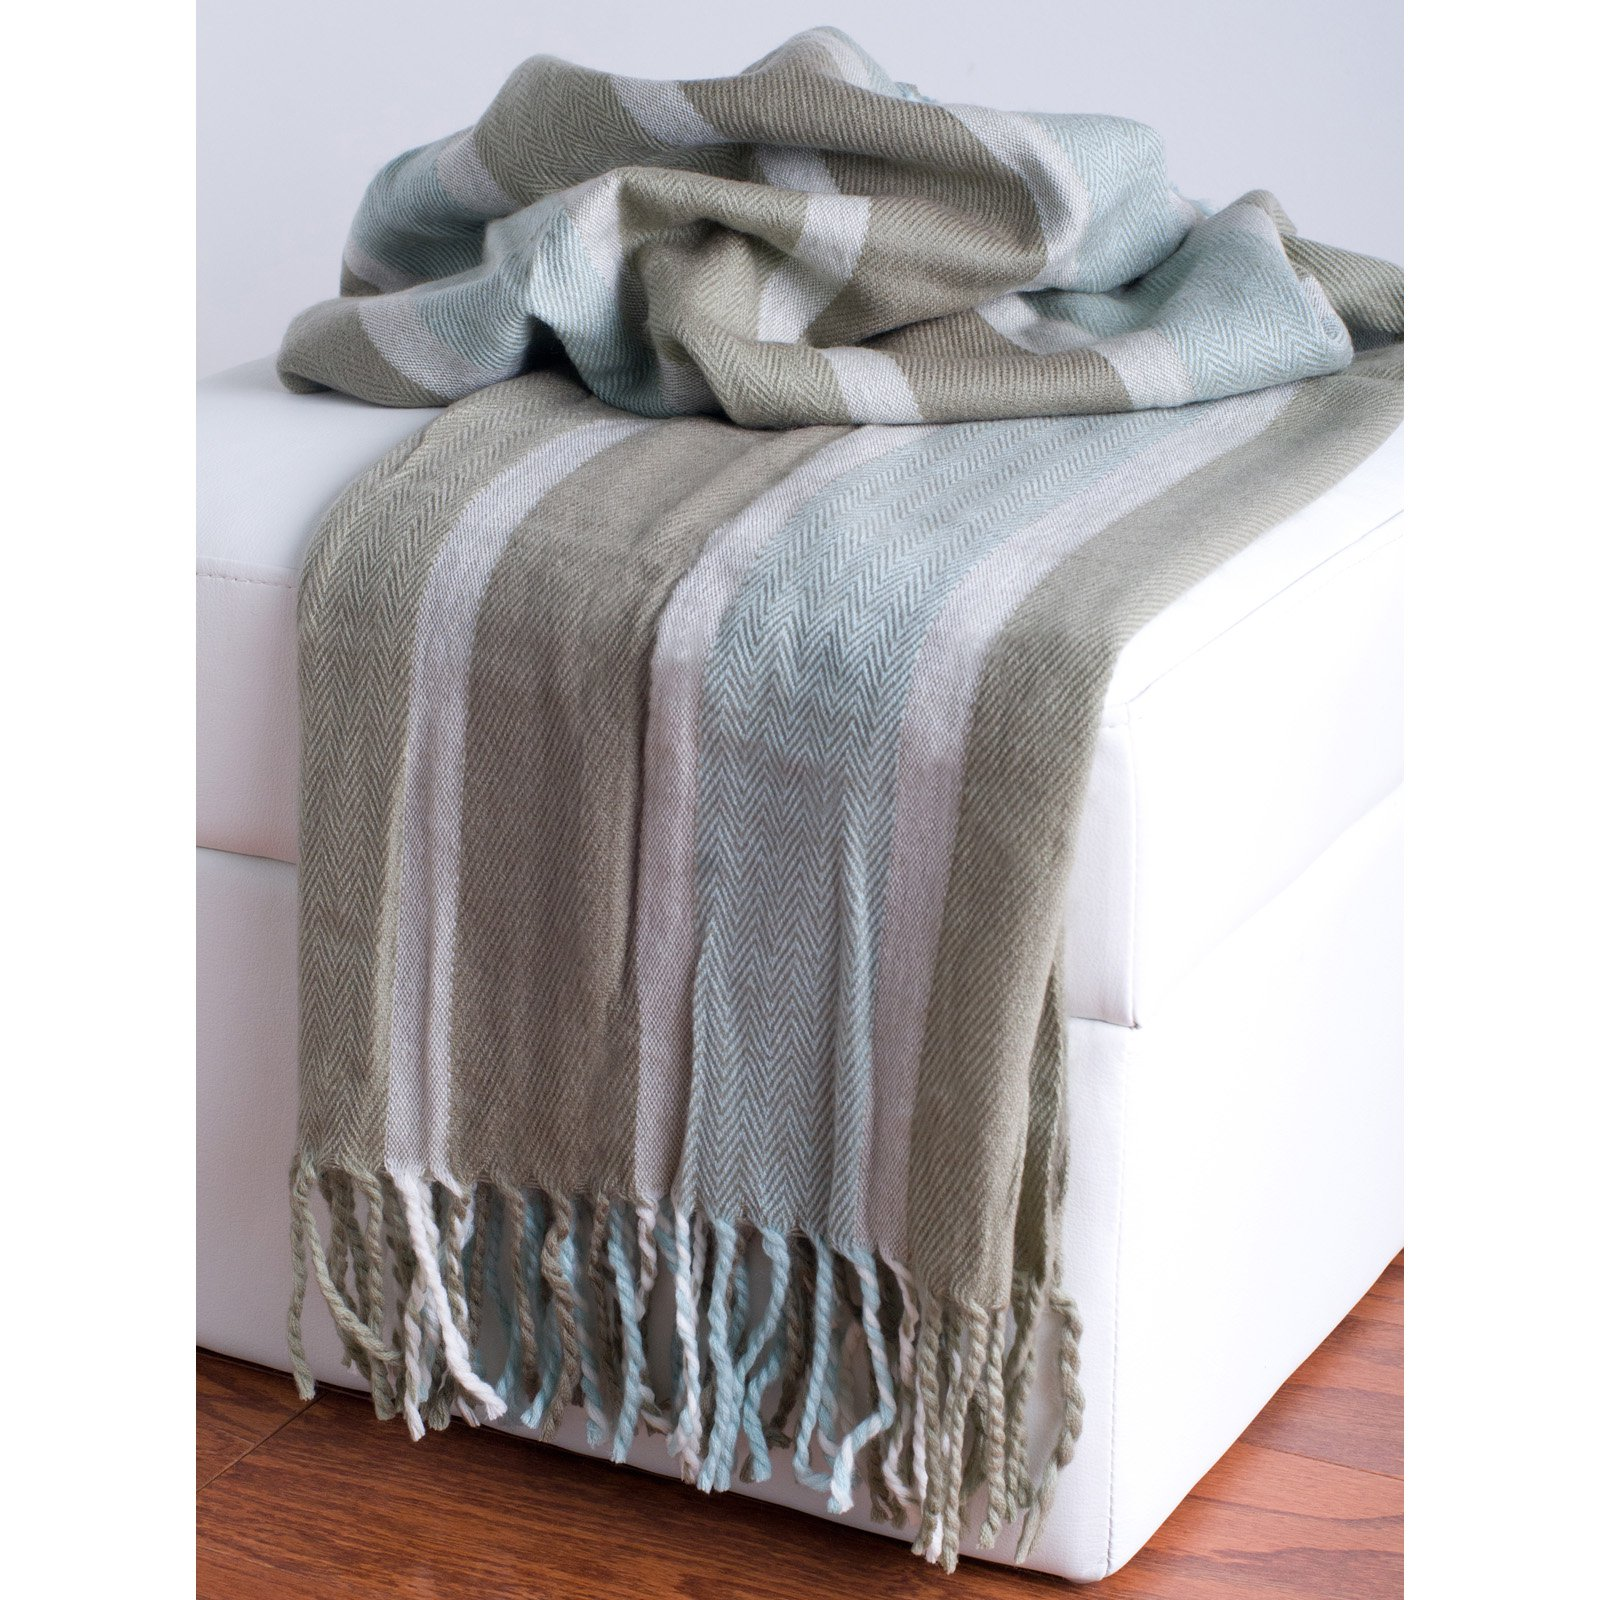 Rizzy Home Loom Woven Beige & Blue Luxury Throw Blanket